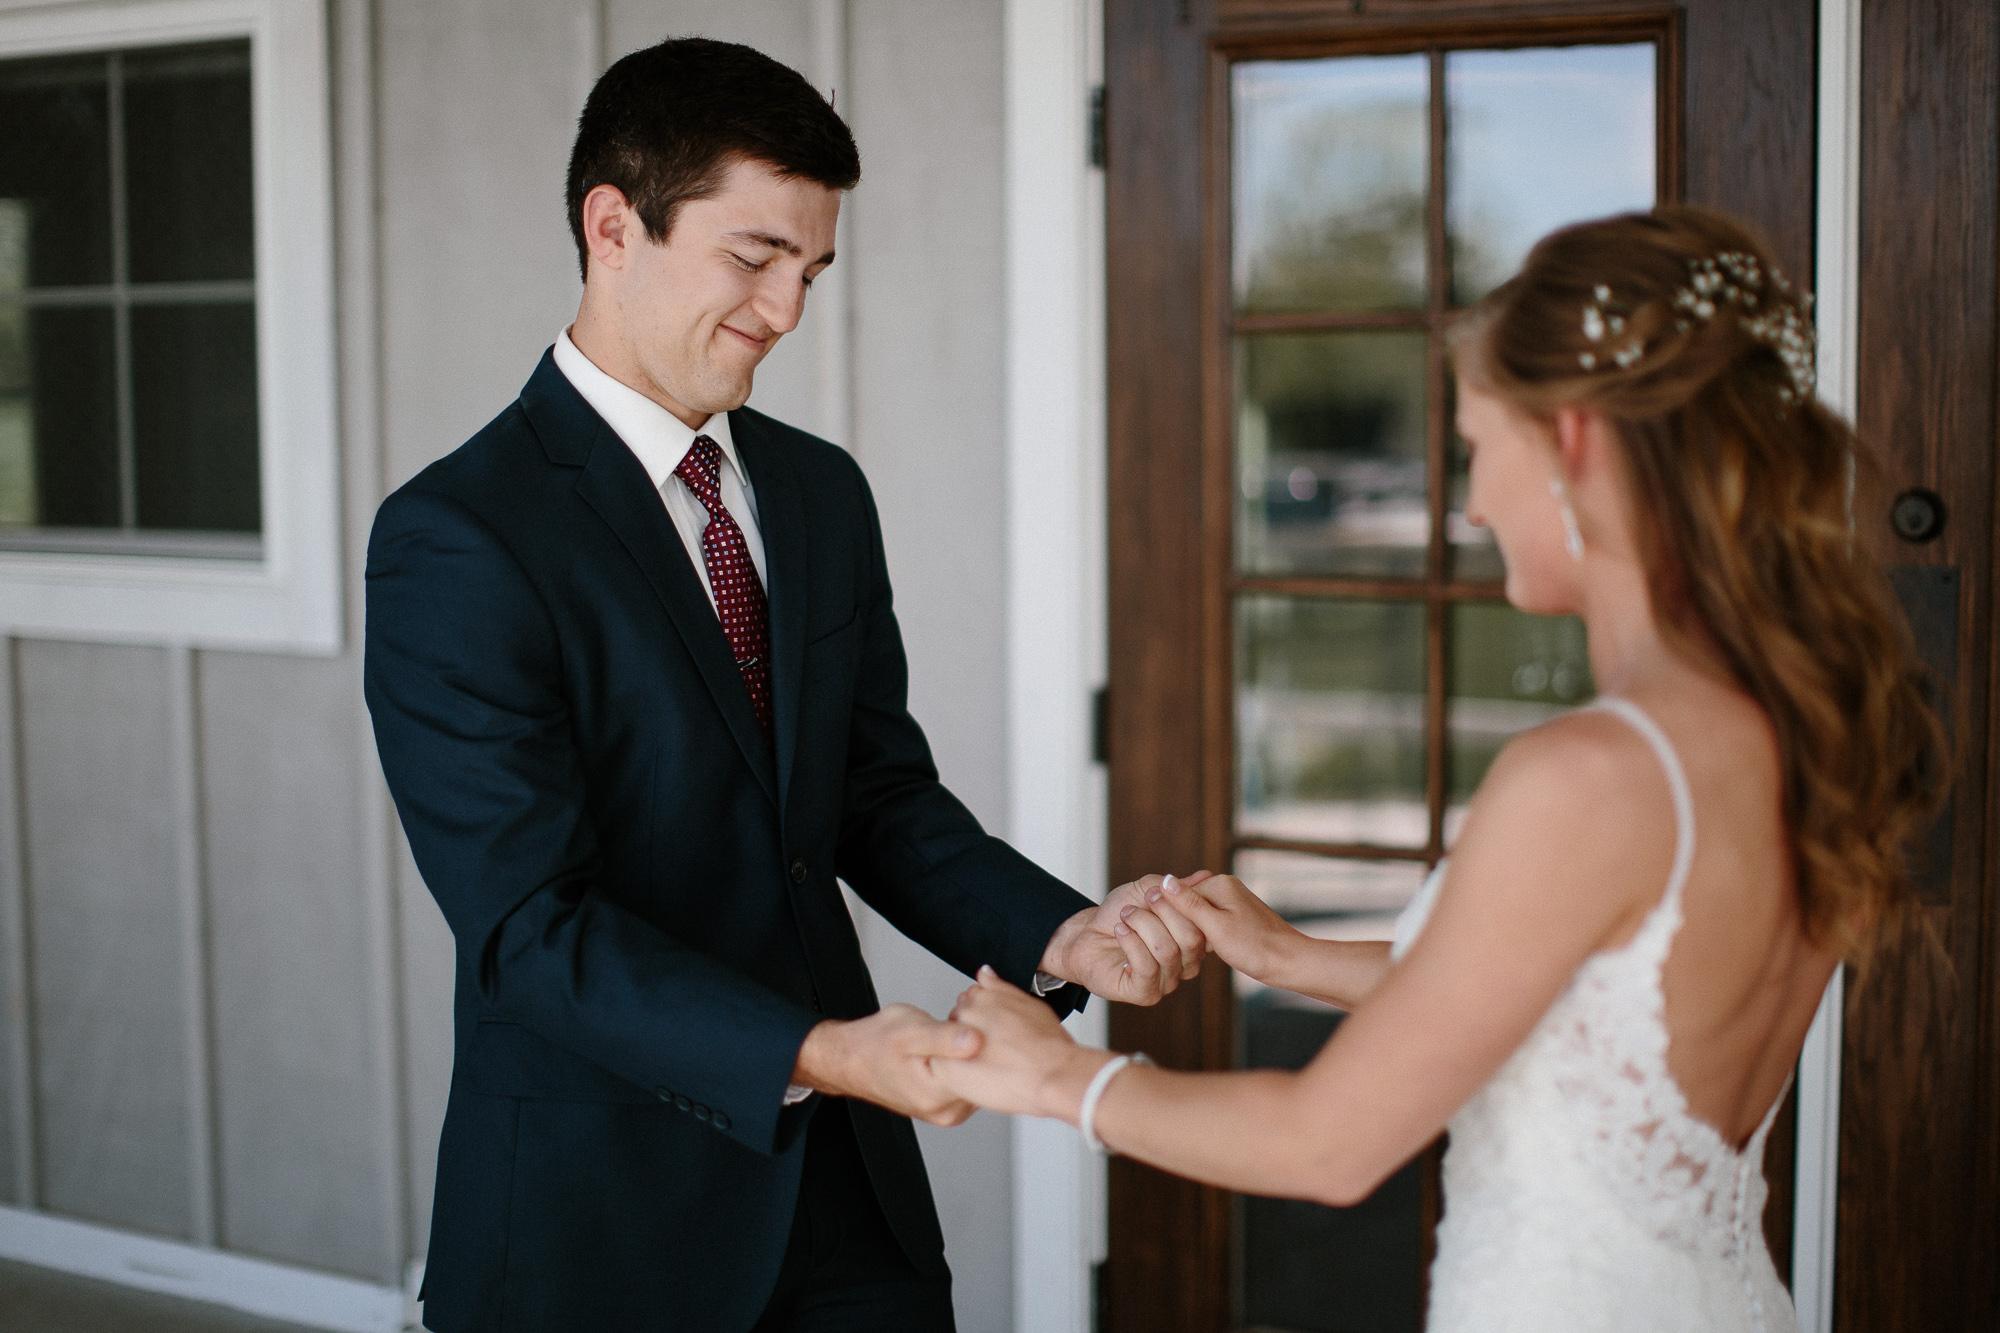 wedding-elopement-adventerous-romantic-timeless-south-dakota-blue-haven-barn-022.jpg